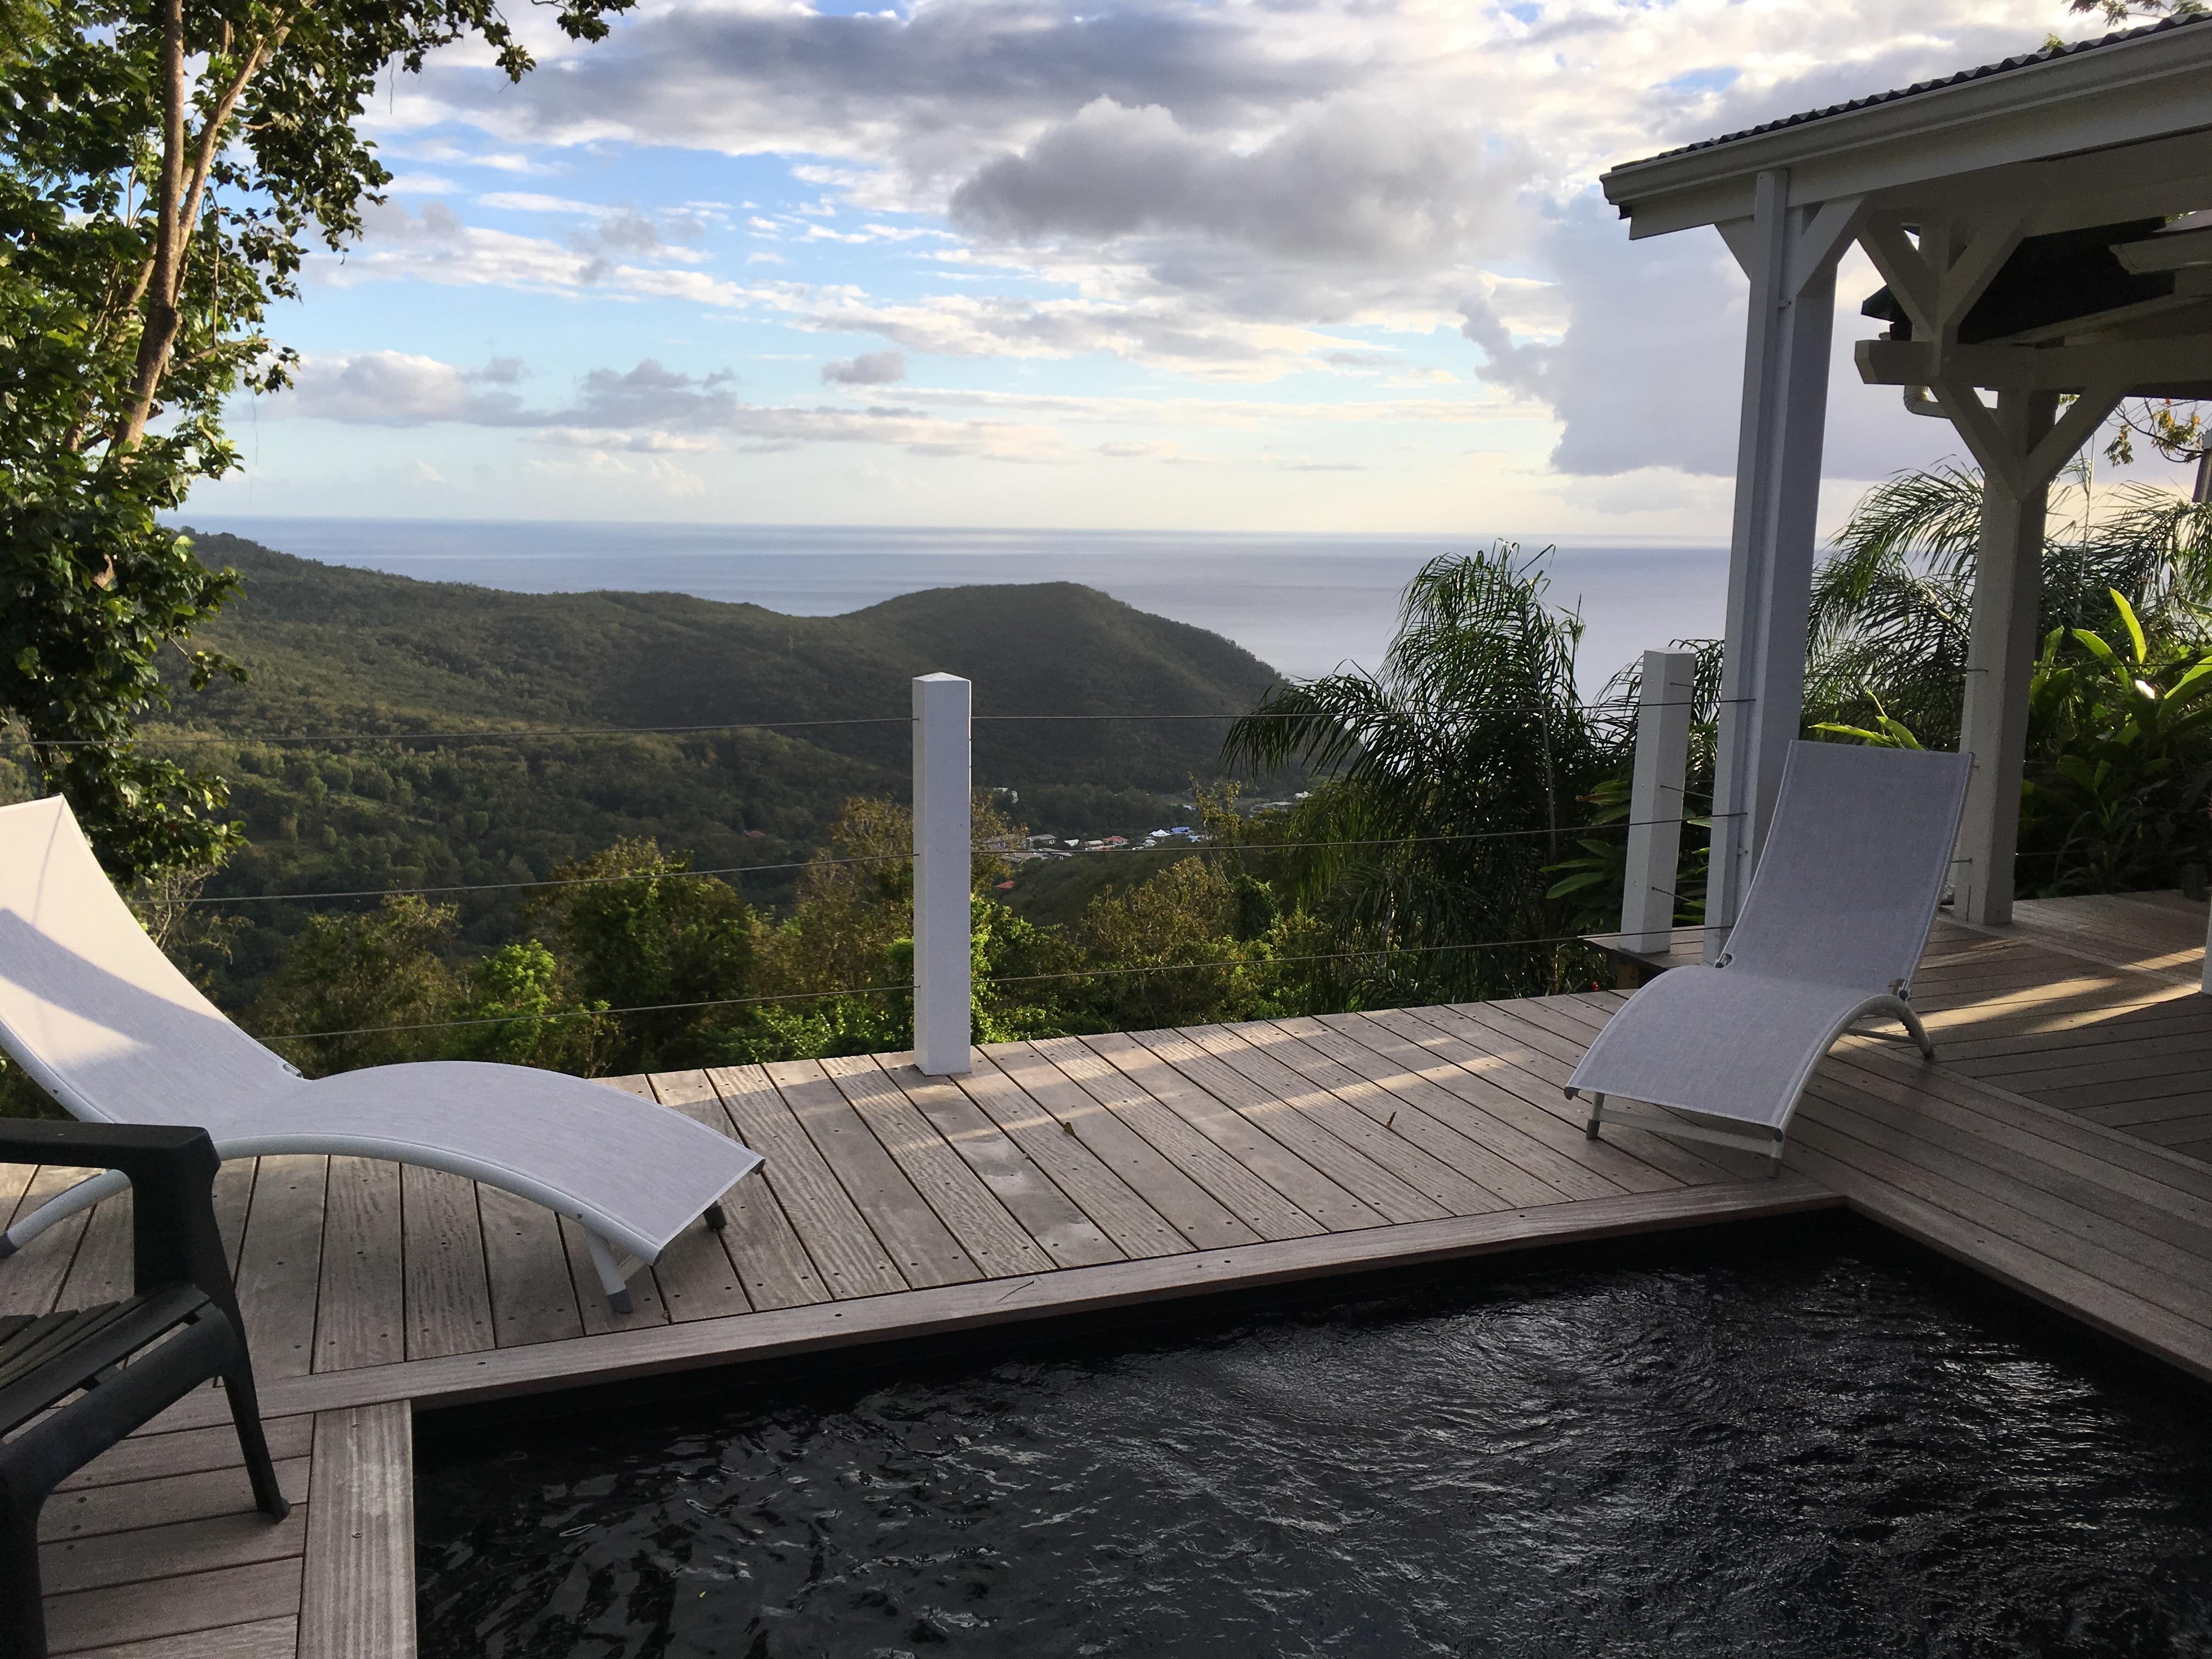 Location de gite basse terre avec piscine la belle - Bungalow guadeloupe piscine privee ...